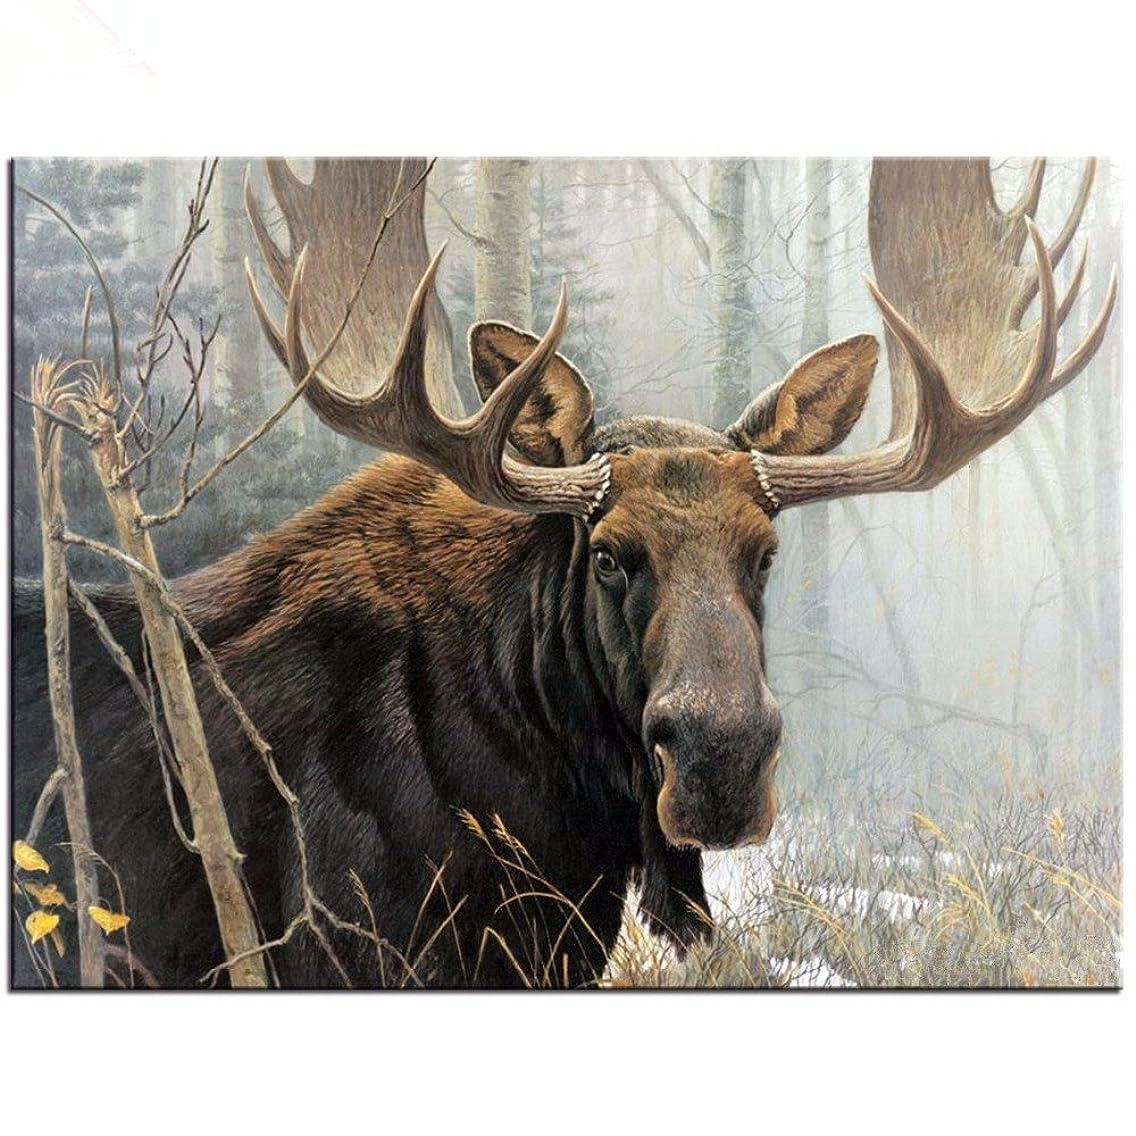 Yumeart Full Diamond Embroidery Northwoods Moose Cross Stitch Sets Unfinished Decorative Diamond Painting Deer Animals